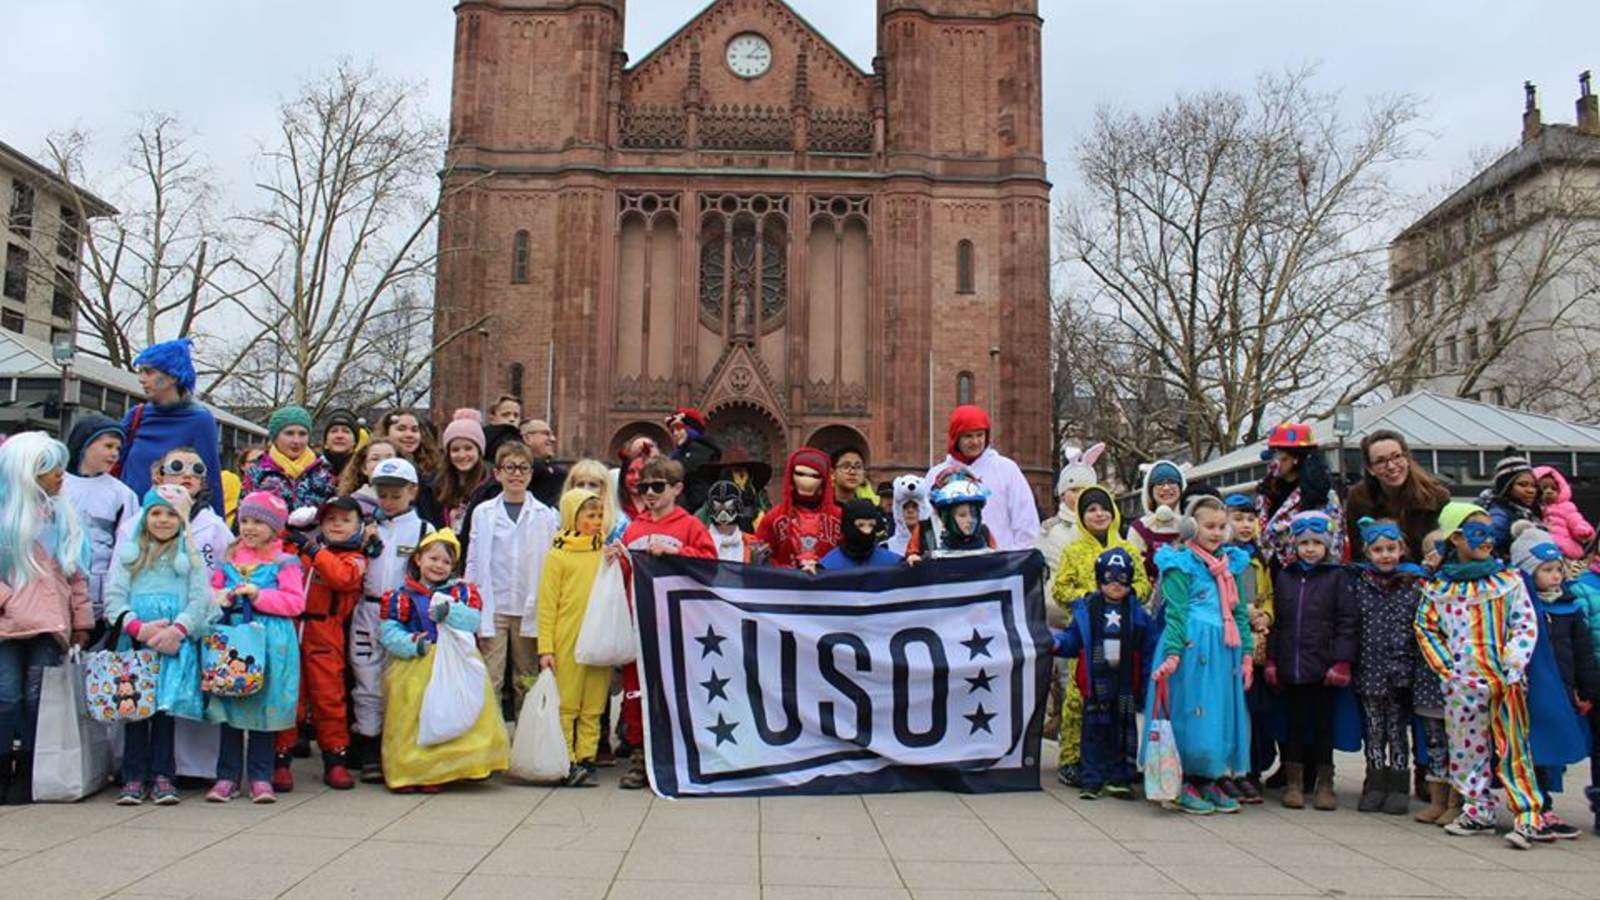 Bb Wiesbaden wiesbaden s kinderfasching parade uso wiesbaden